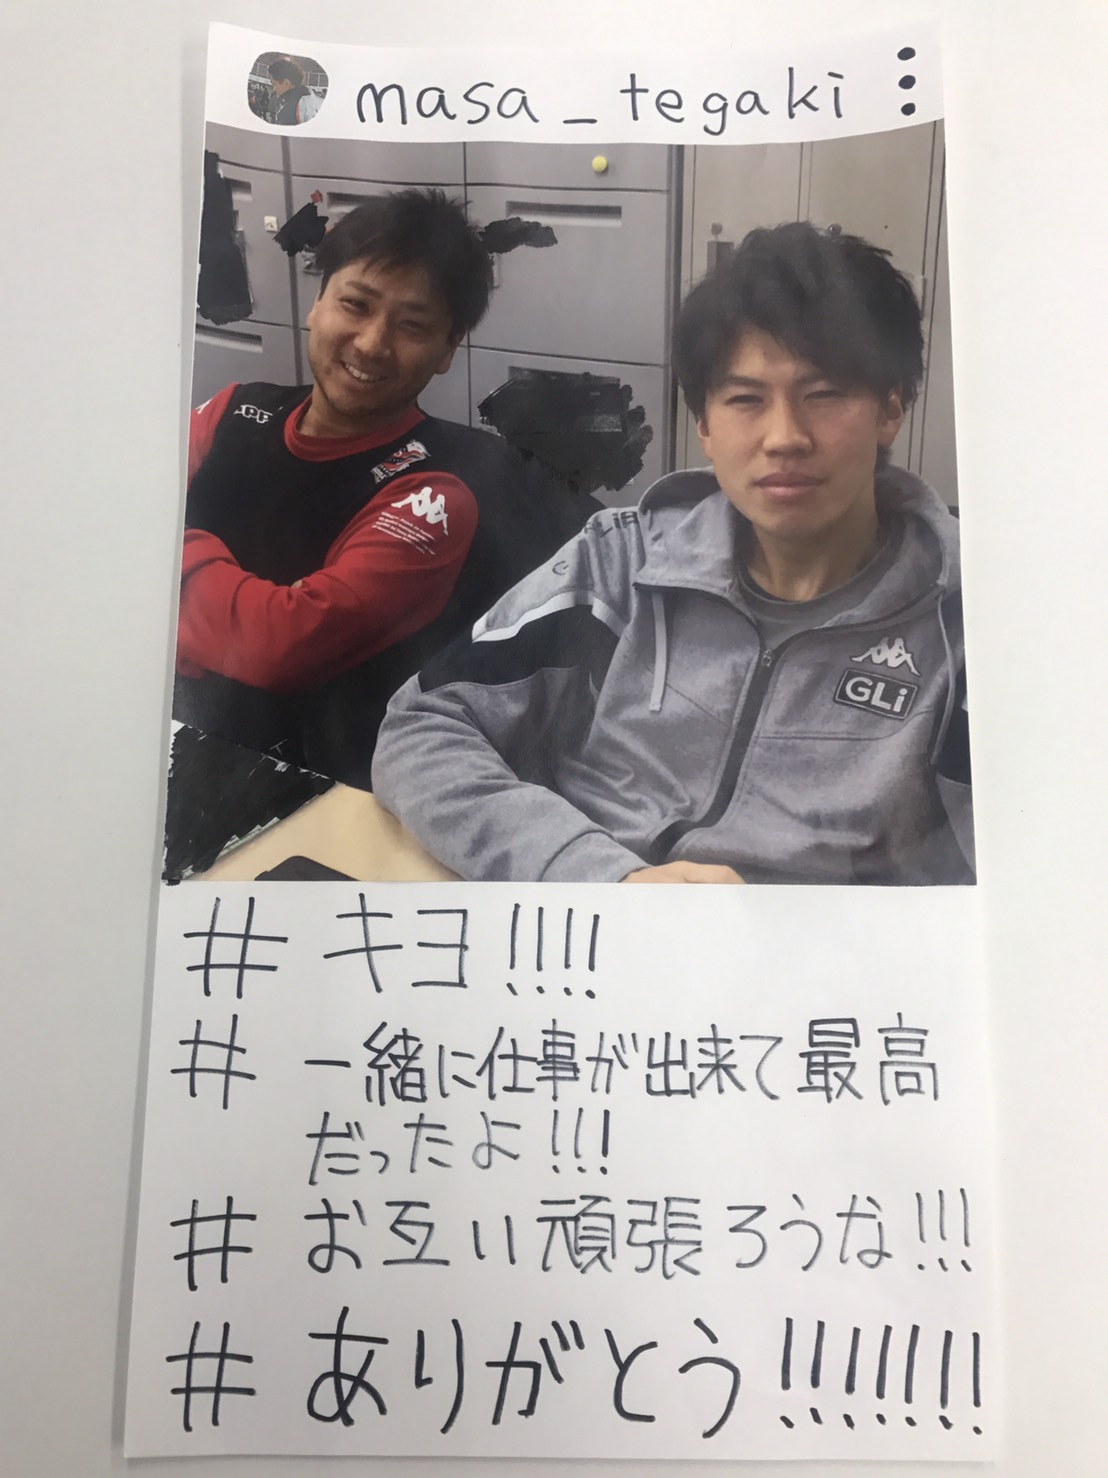 http://chsc.jp/report/up_images/2BB90C5B-EE5A-44D5-B95B-789B563B5CDC.jpeg